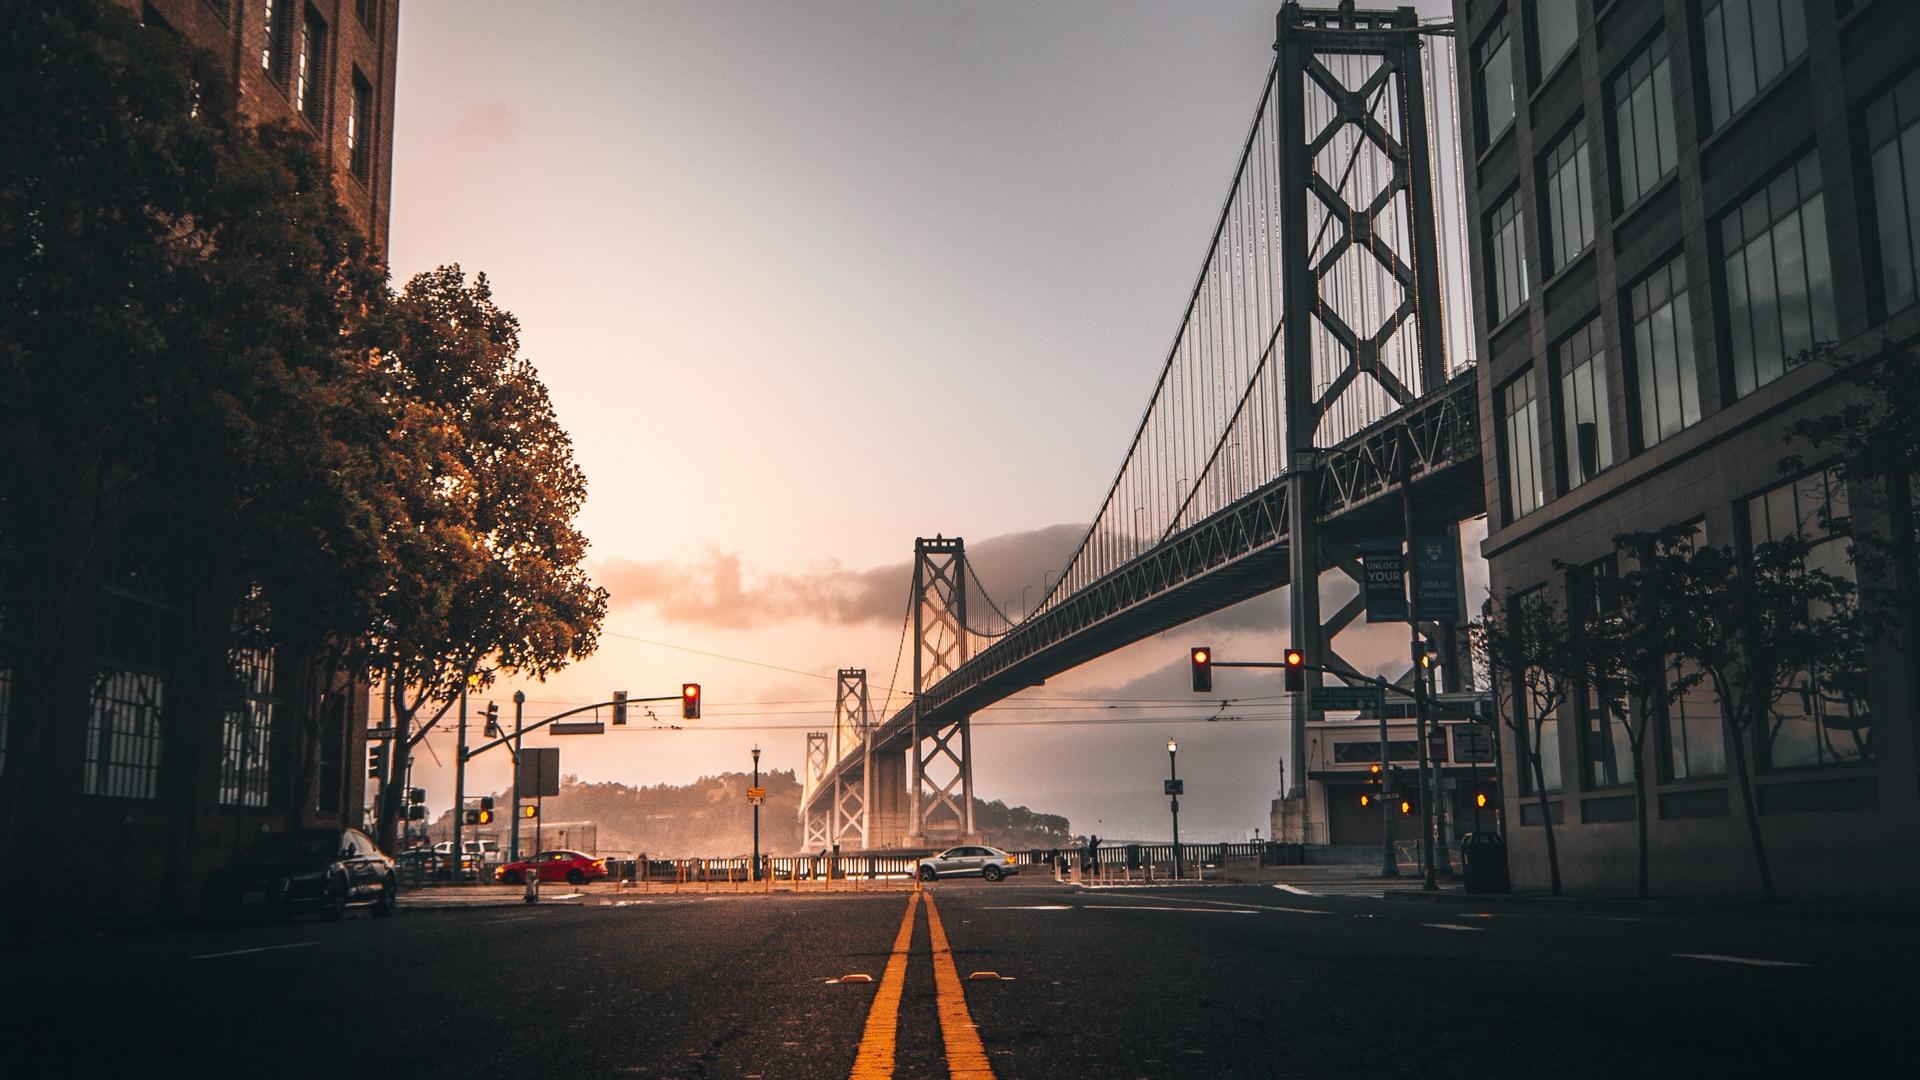 General 1920x1080 road bridge San Francisco street traffic lights street light California